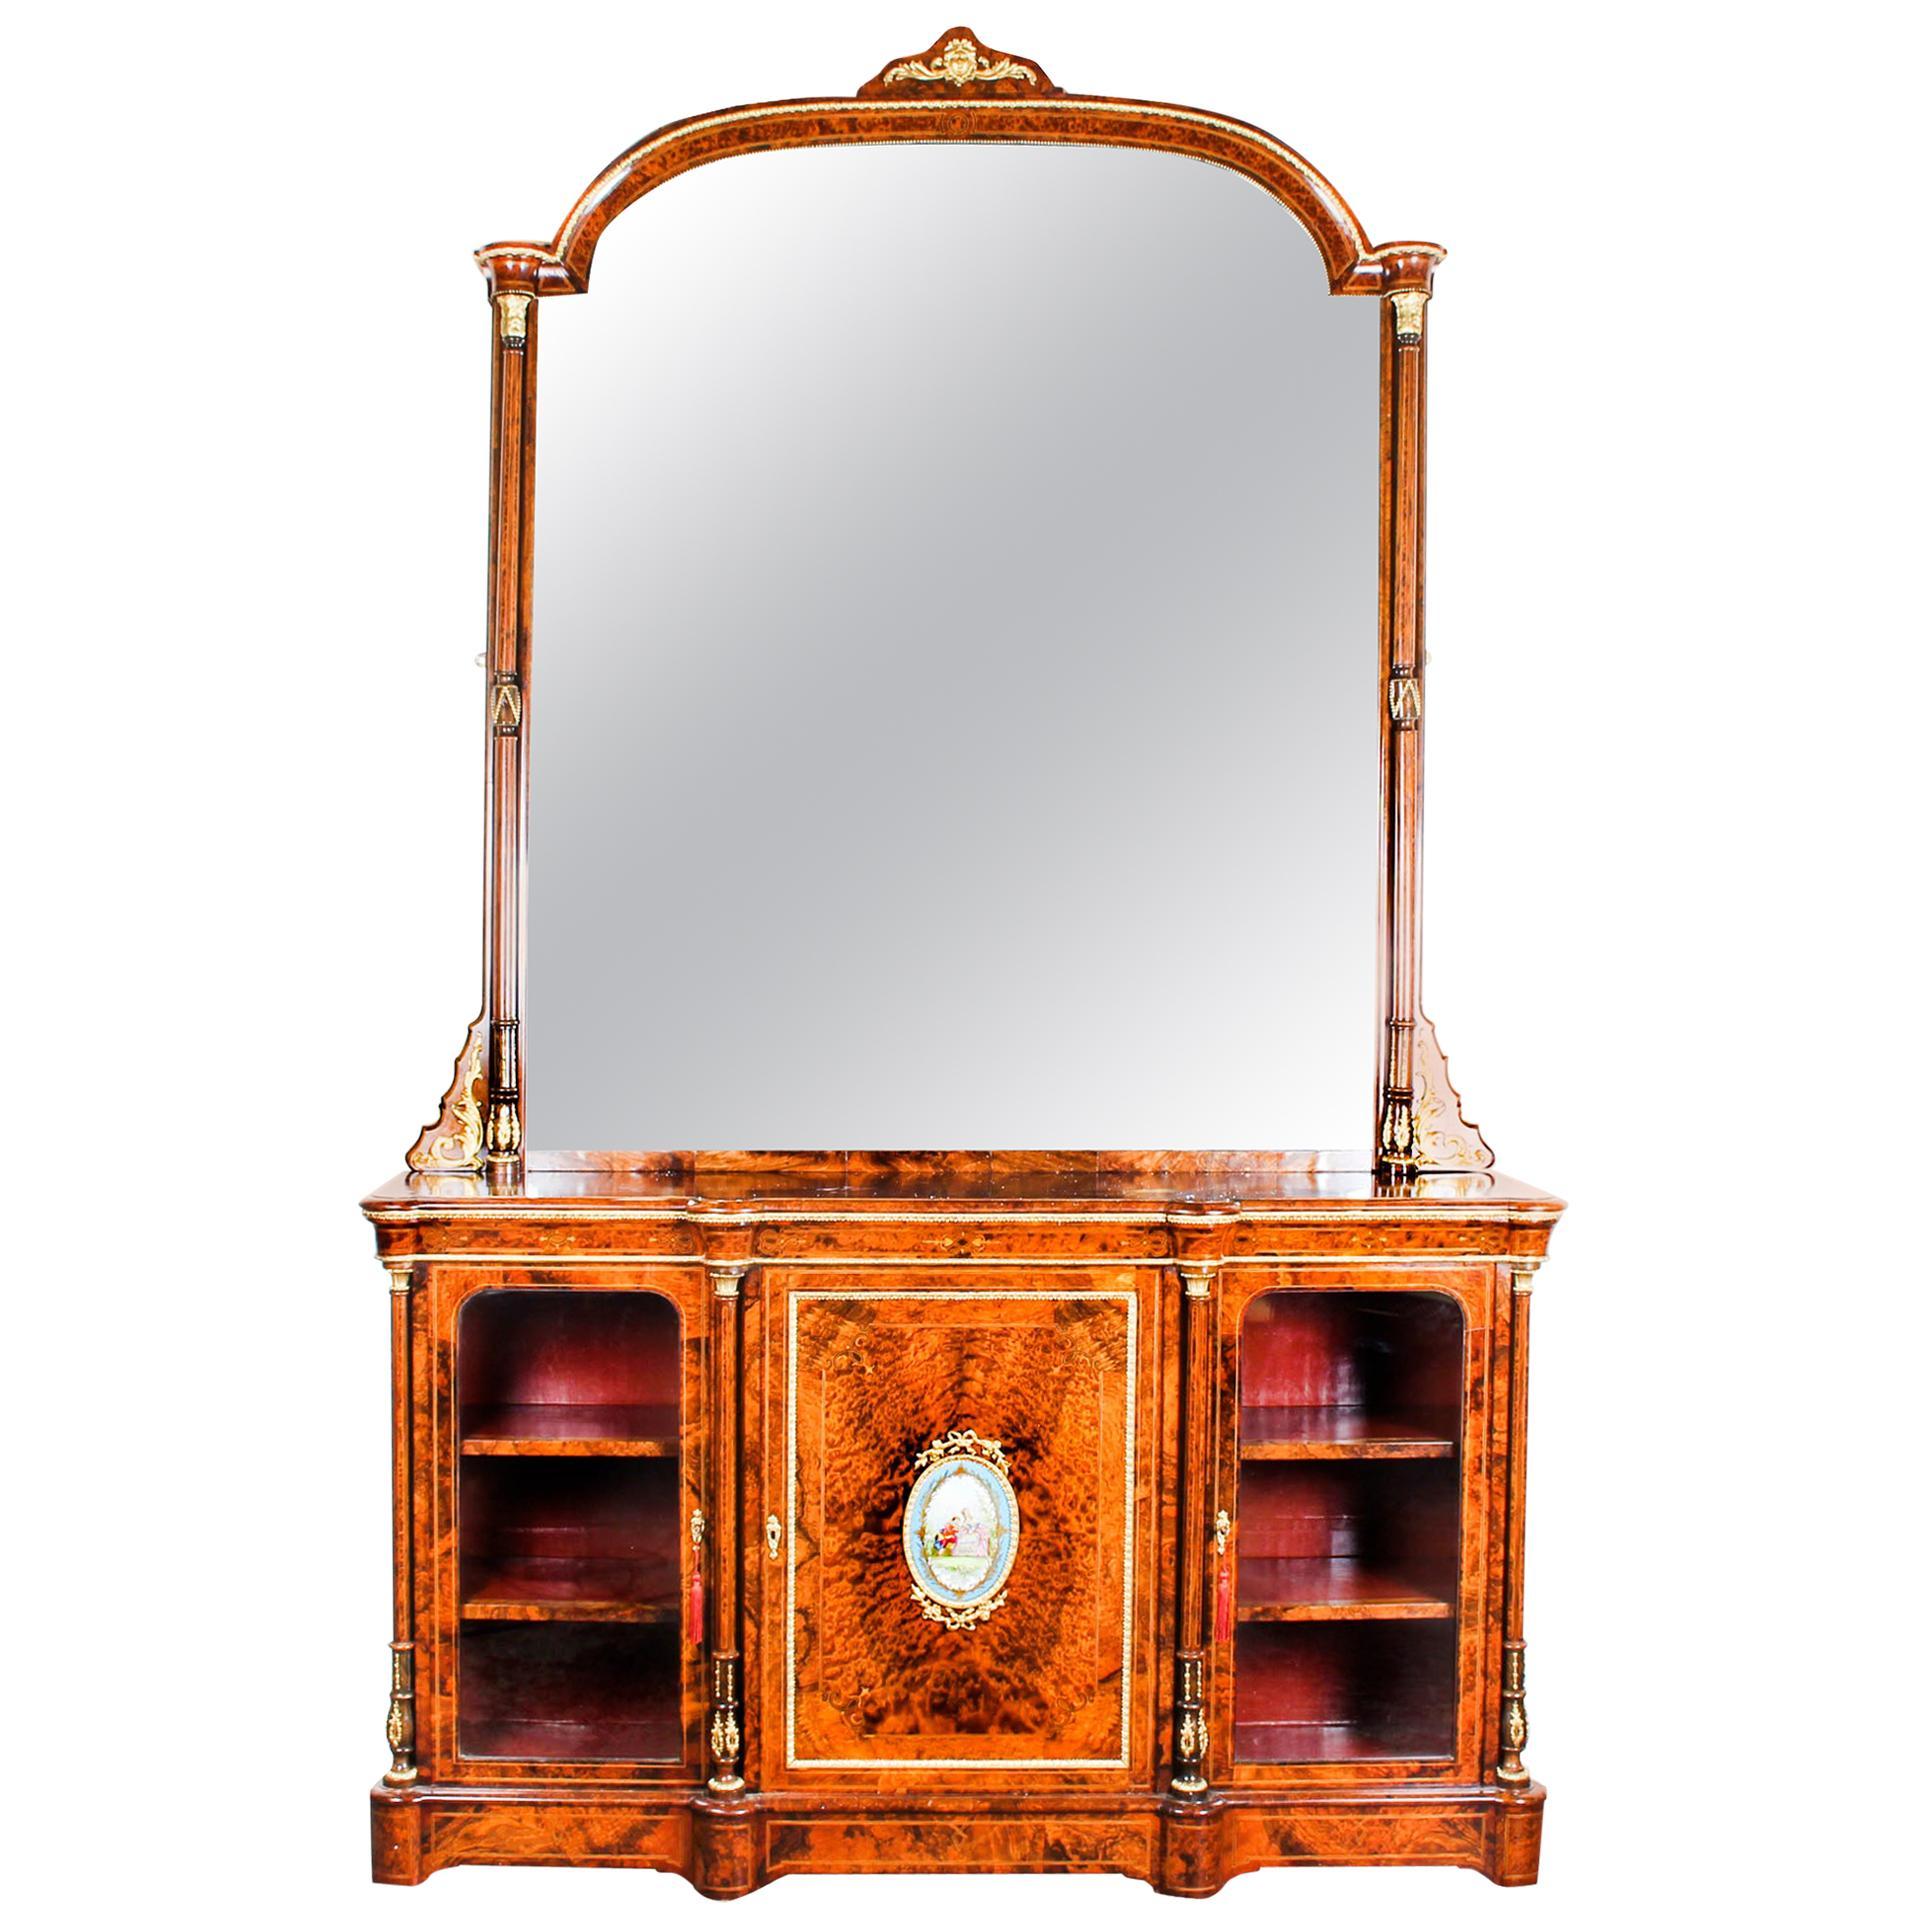 Victorian Burr Walnut Sevres Plaque Mirror Back Credenza Cabinet, 19th Century